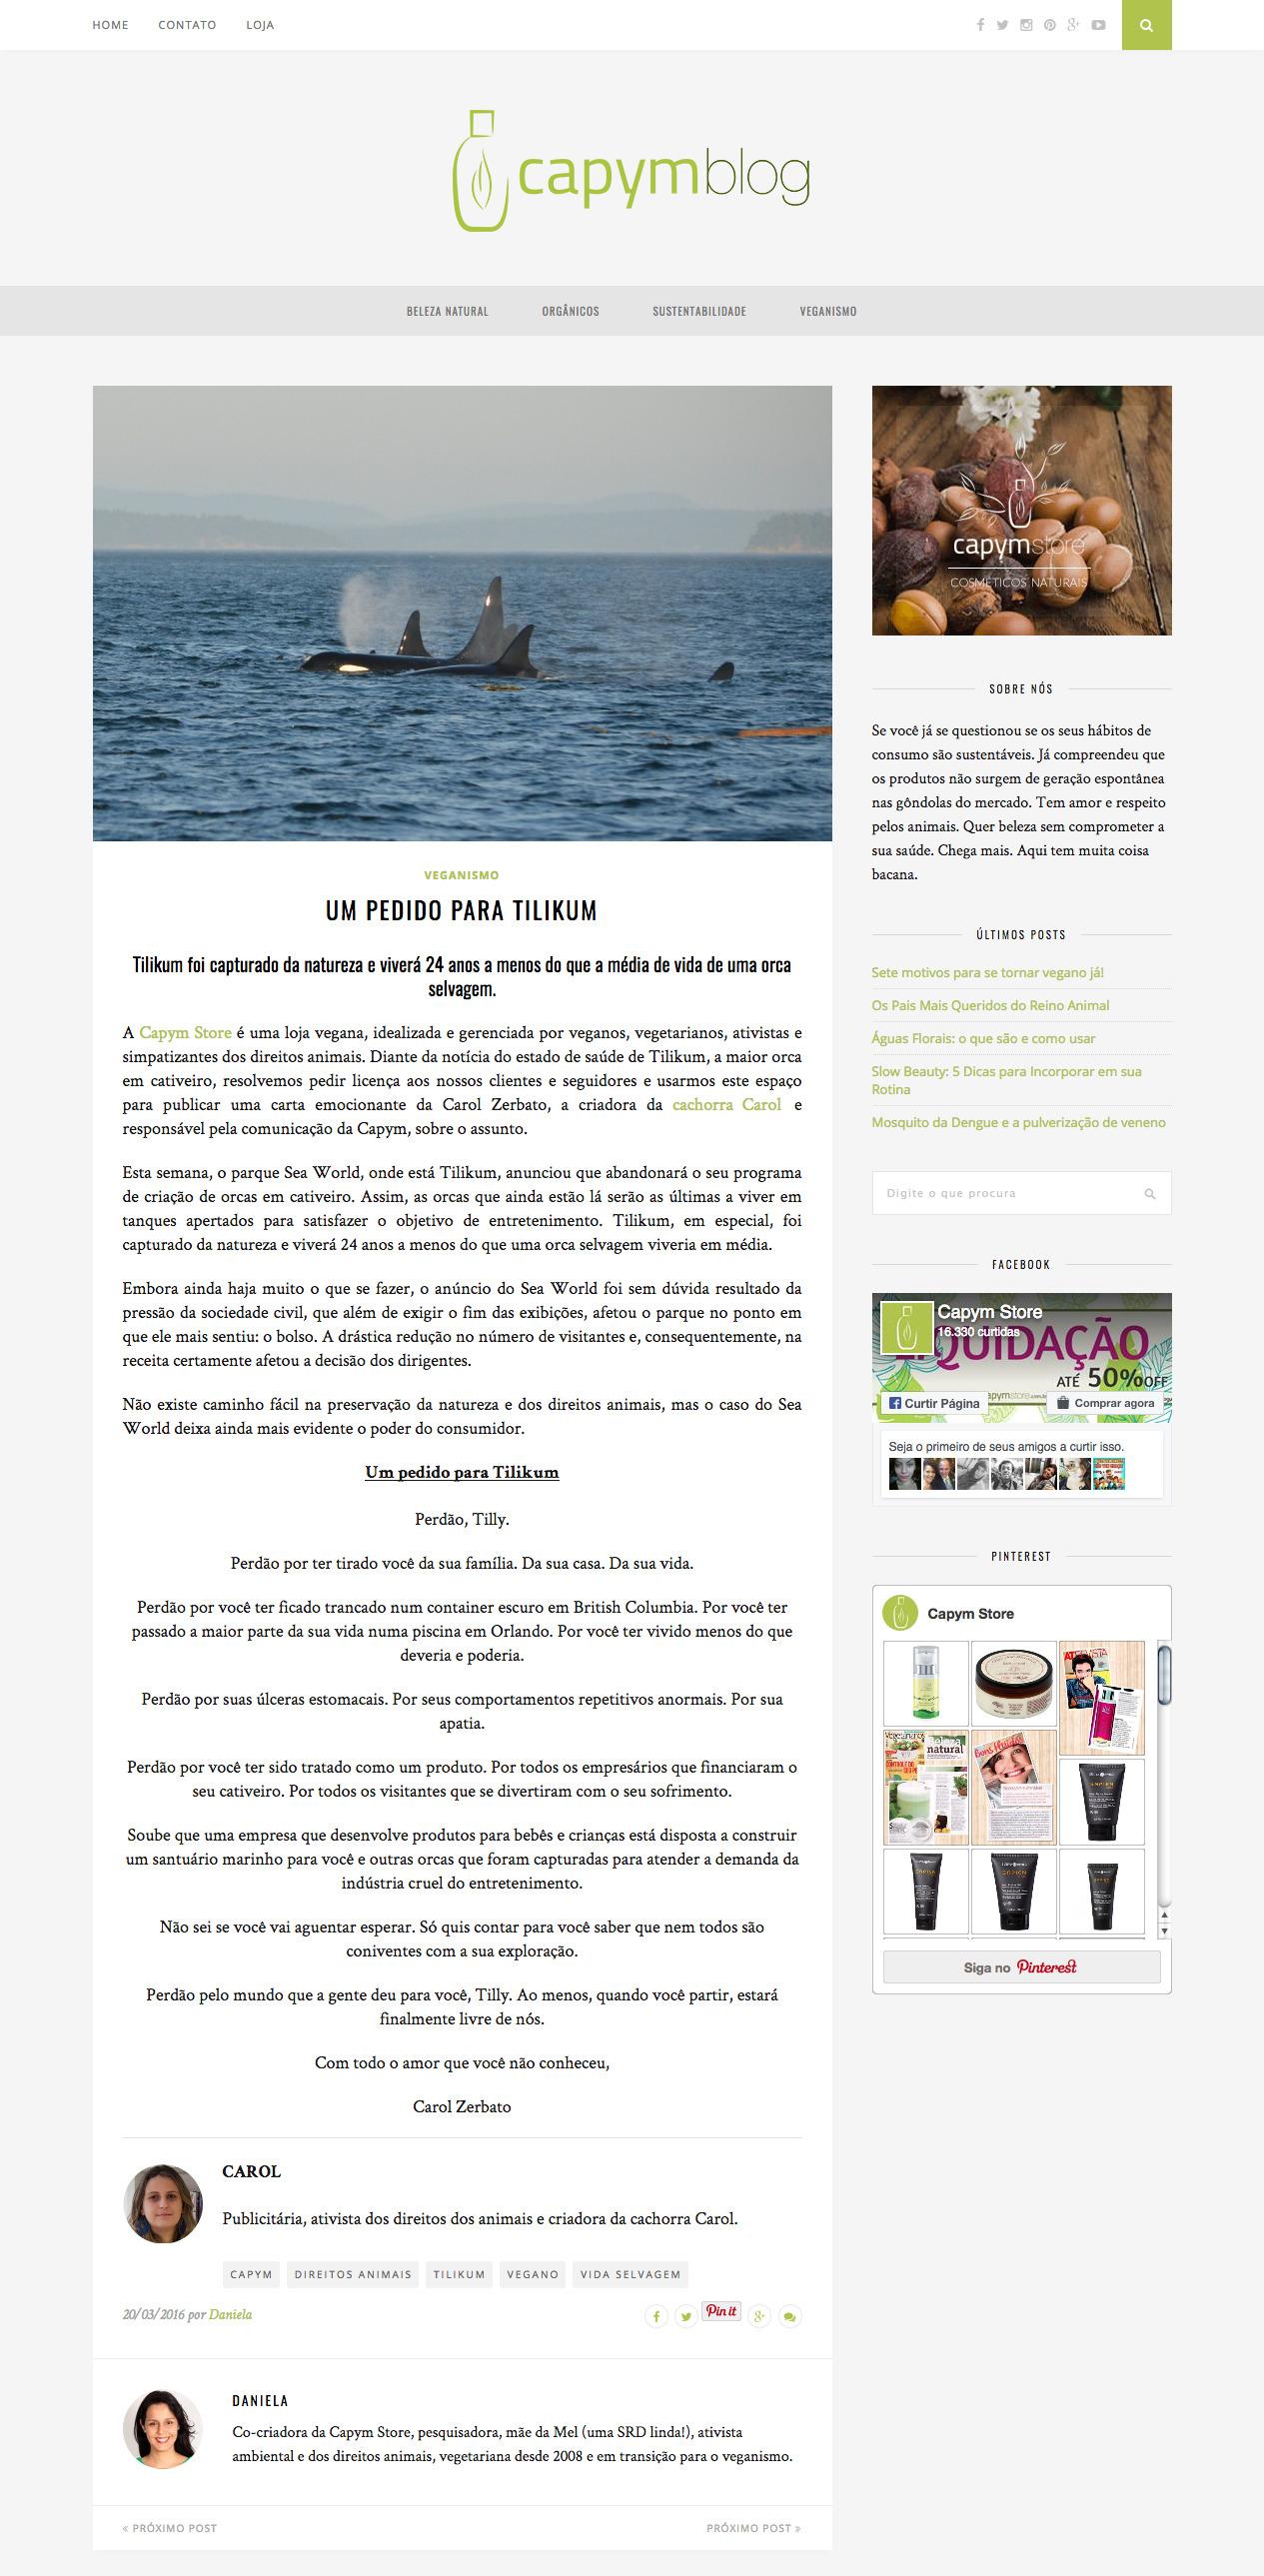 FireShot Capture 17 - Um pedido para Tiliku_ - http___blog.capymstore.com.br_um-pedido-para-tilikum_